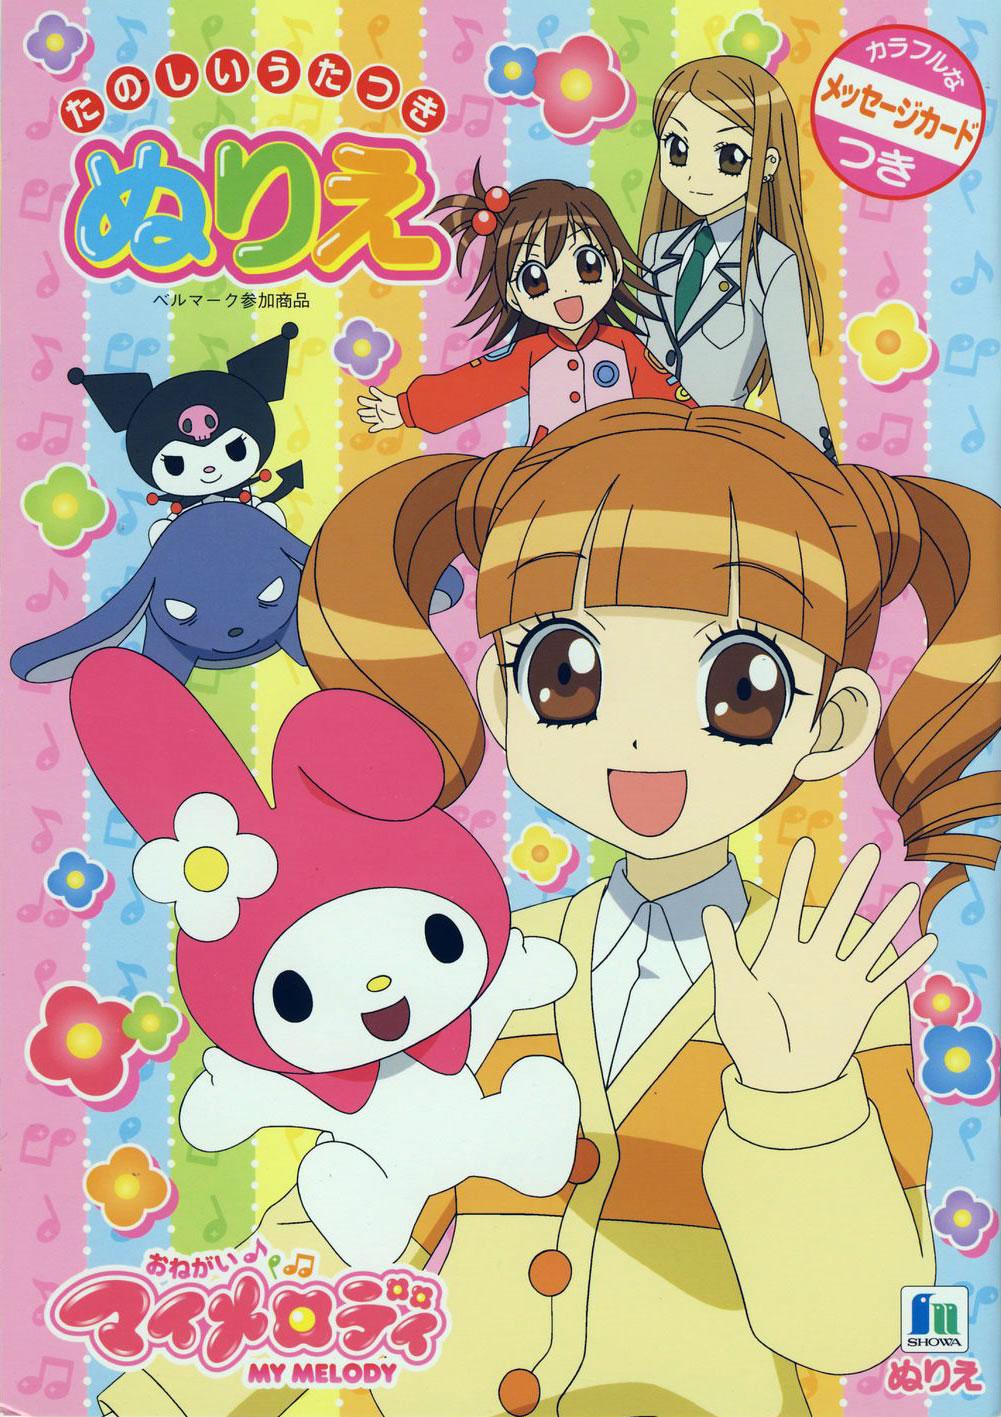 My Melody (2005; Wave) Showa